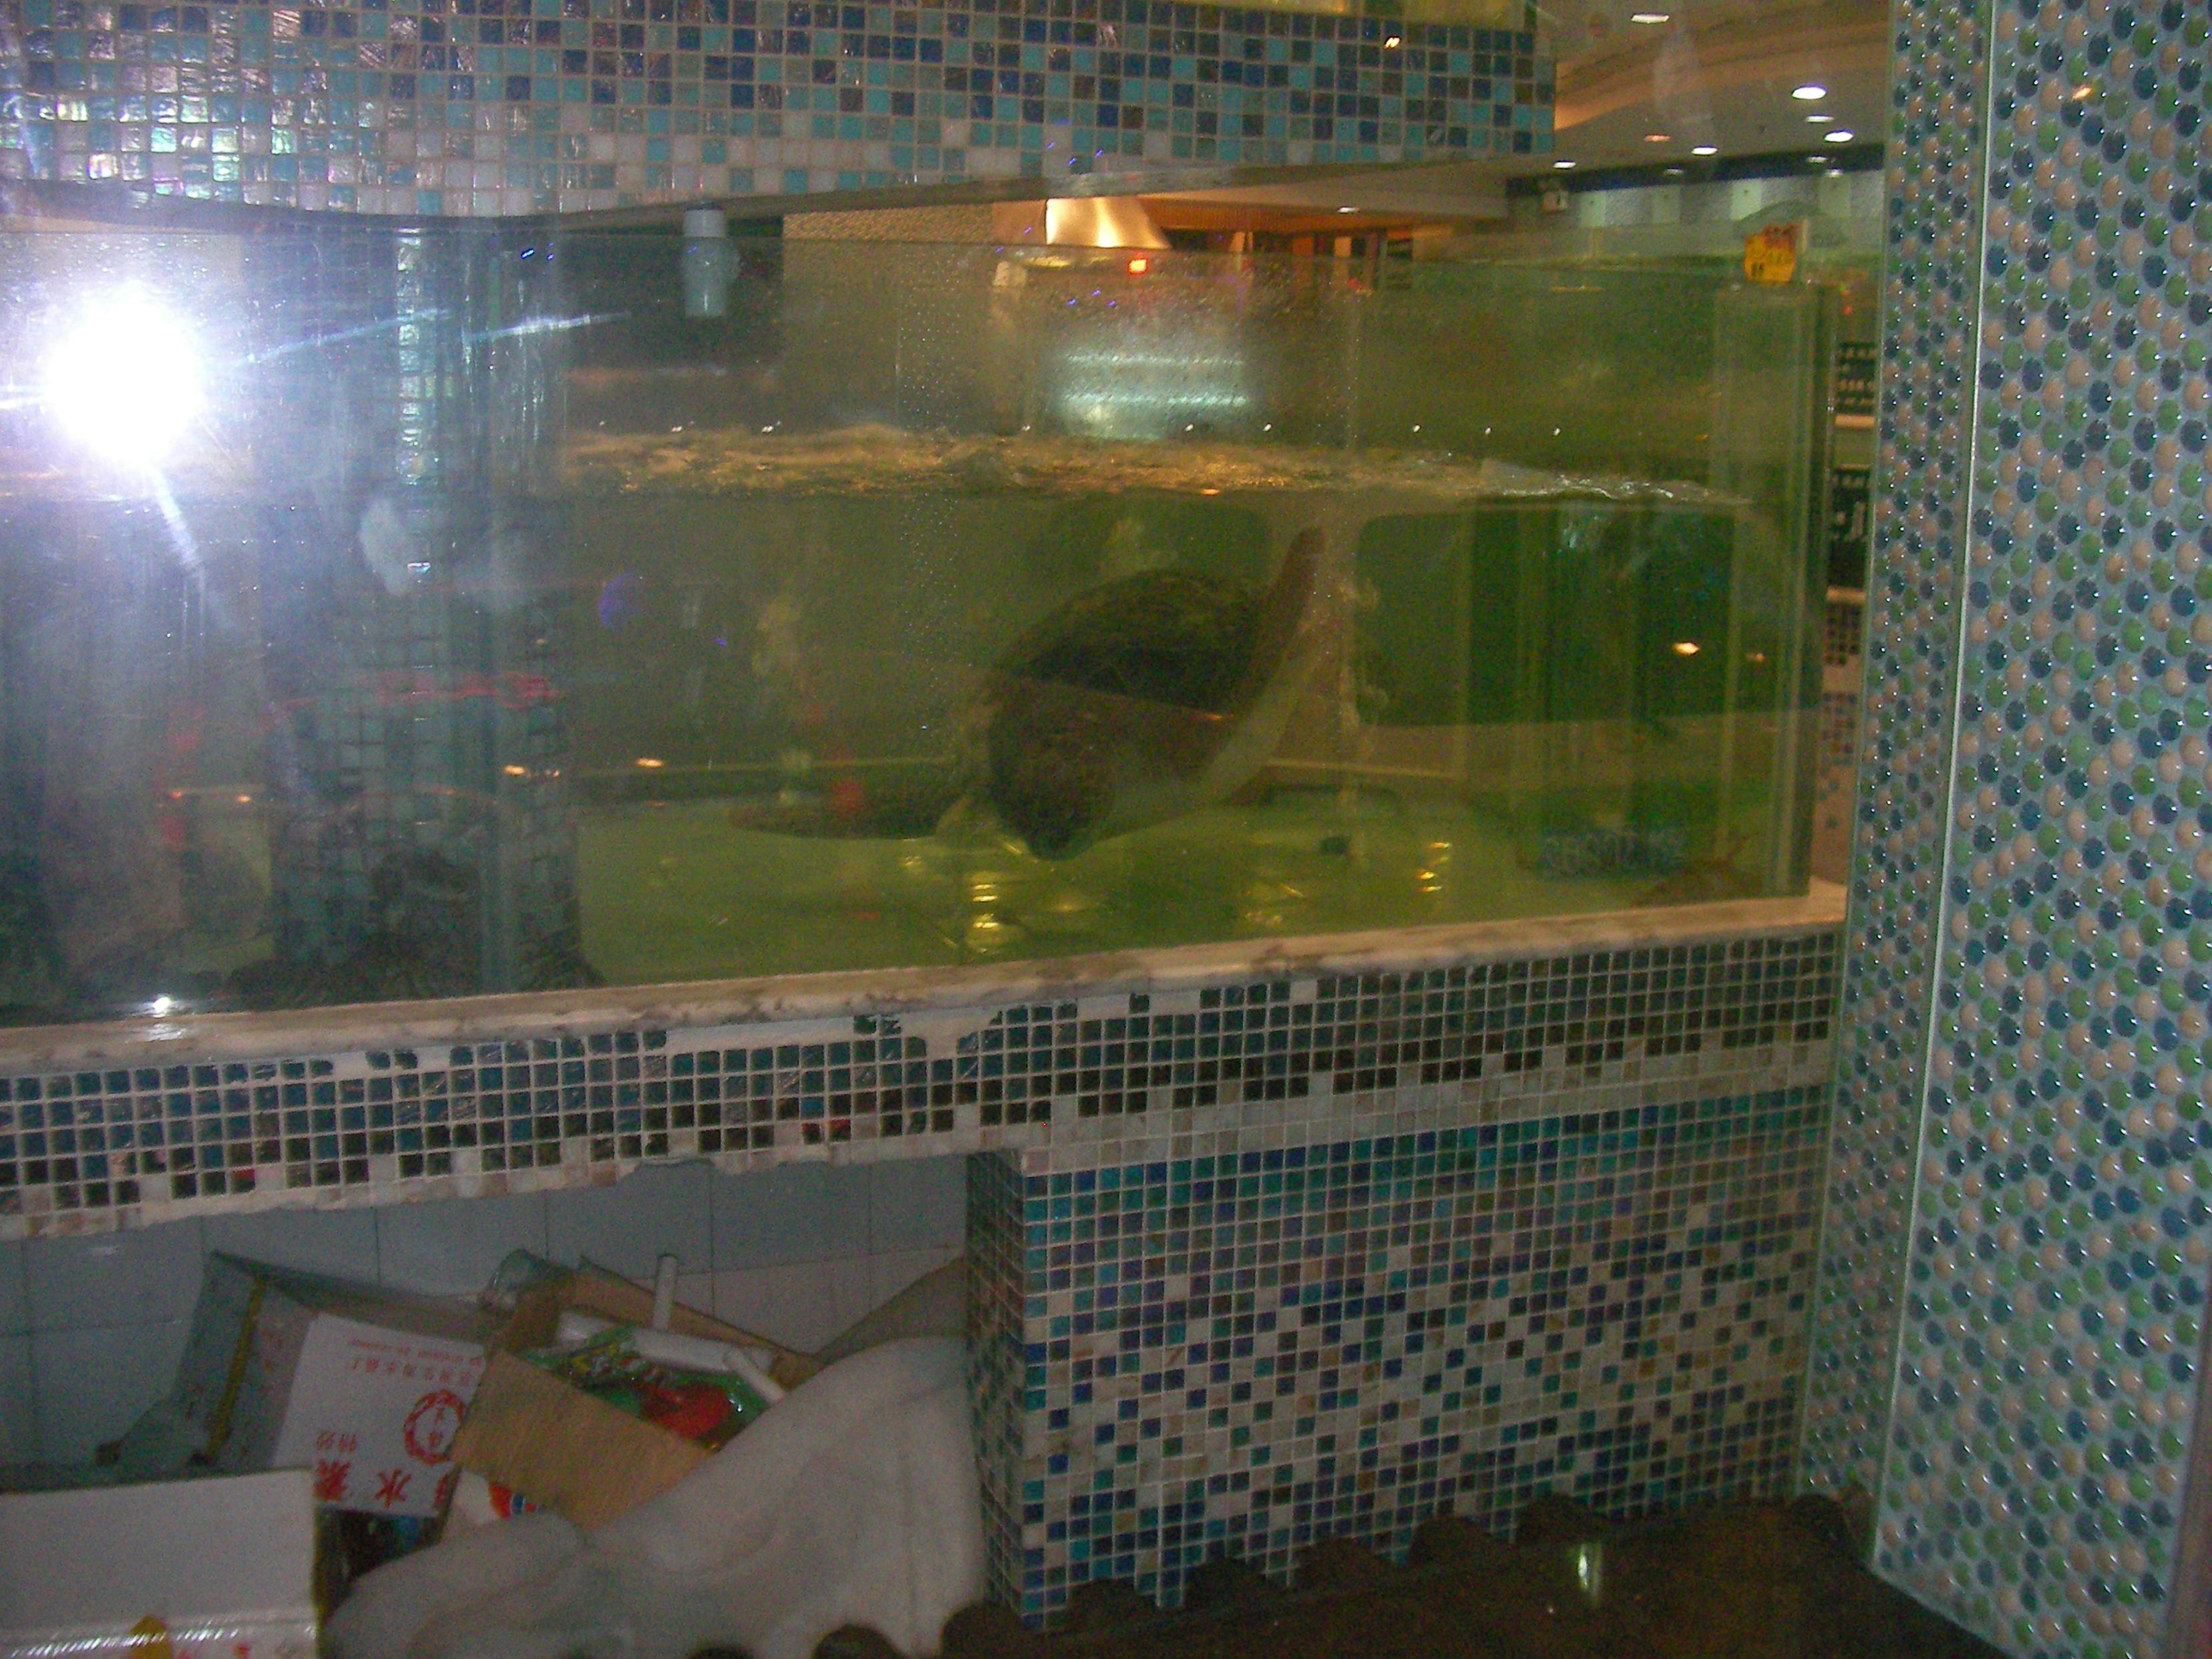 Destination empire du milieu page 5 for Aquarium tortue aquatique